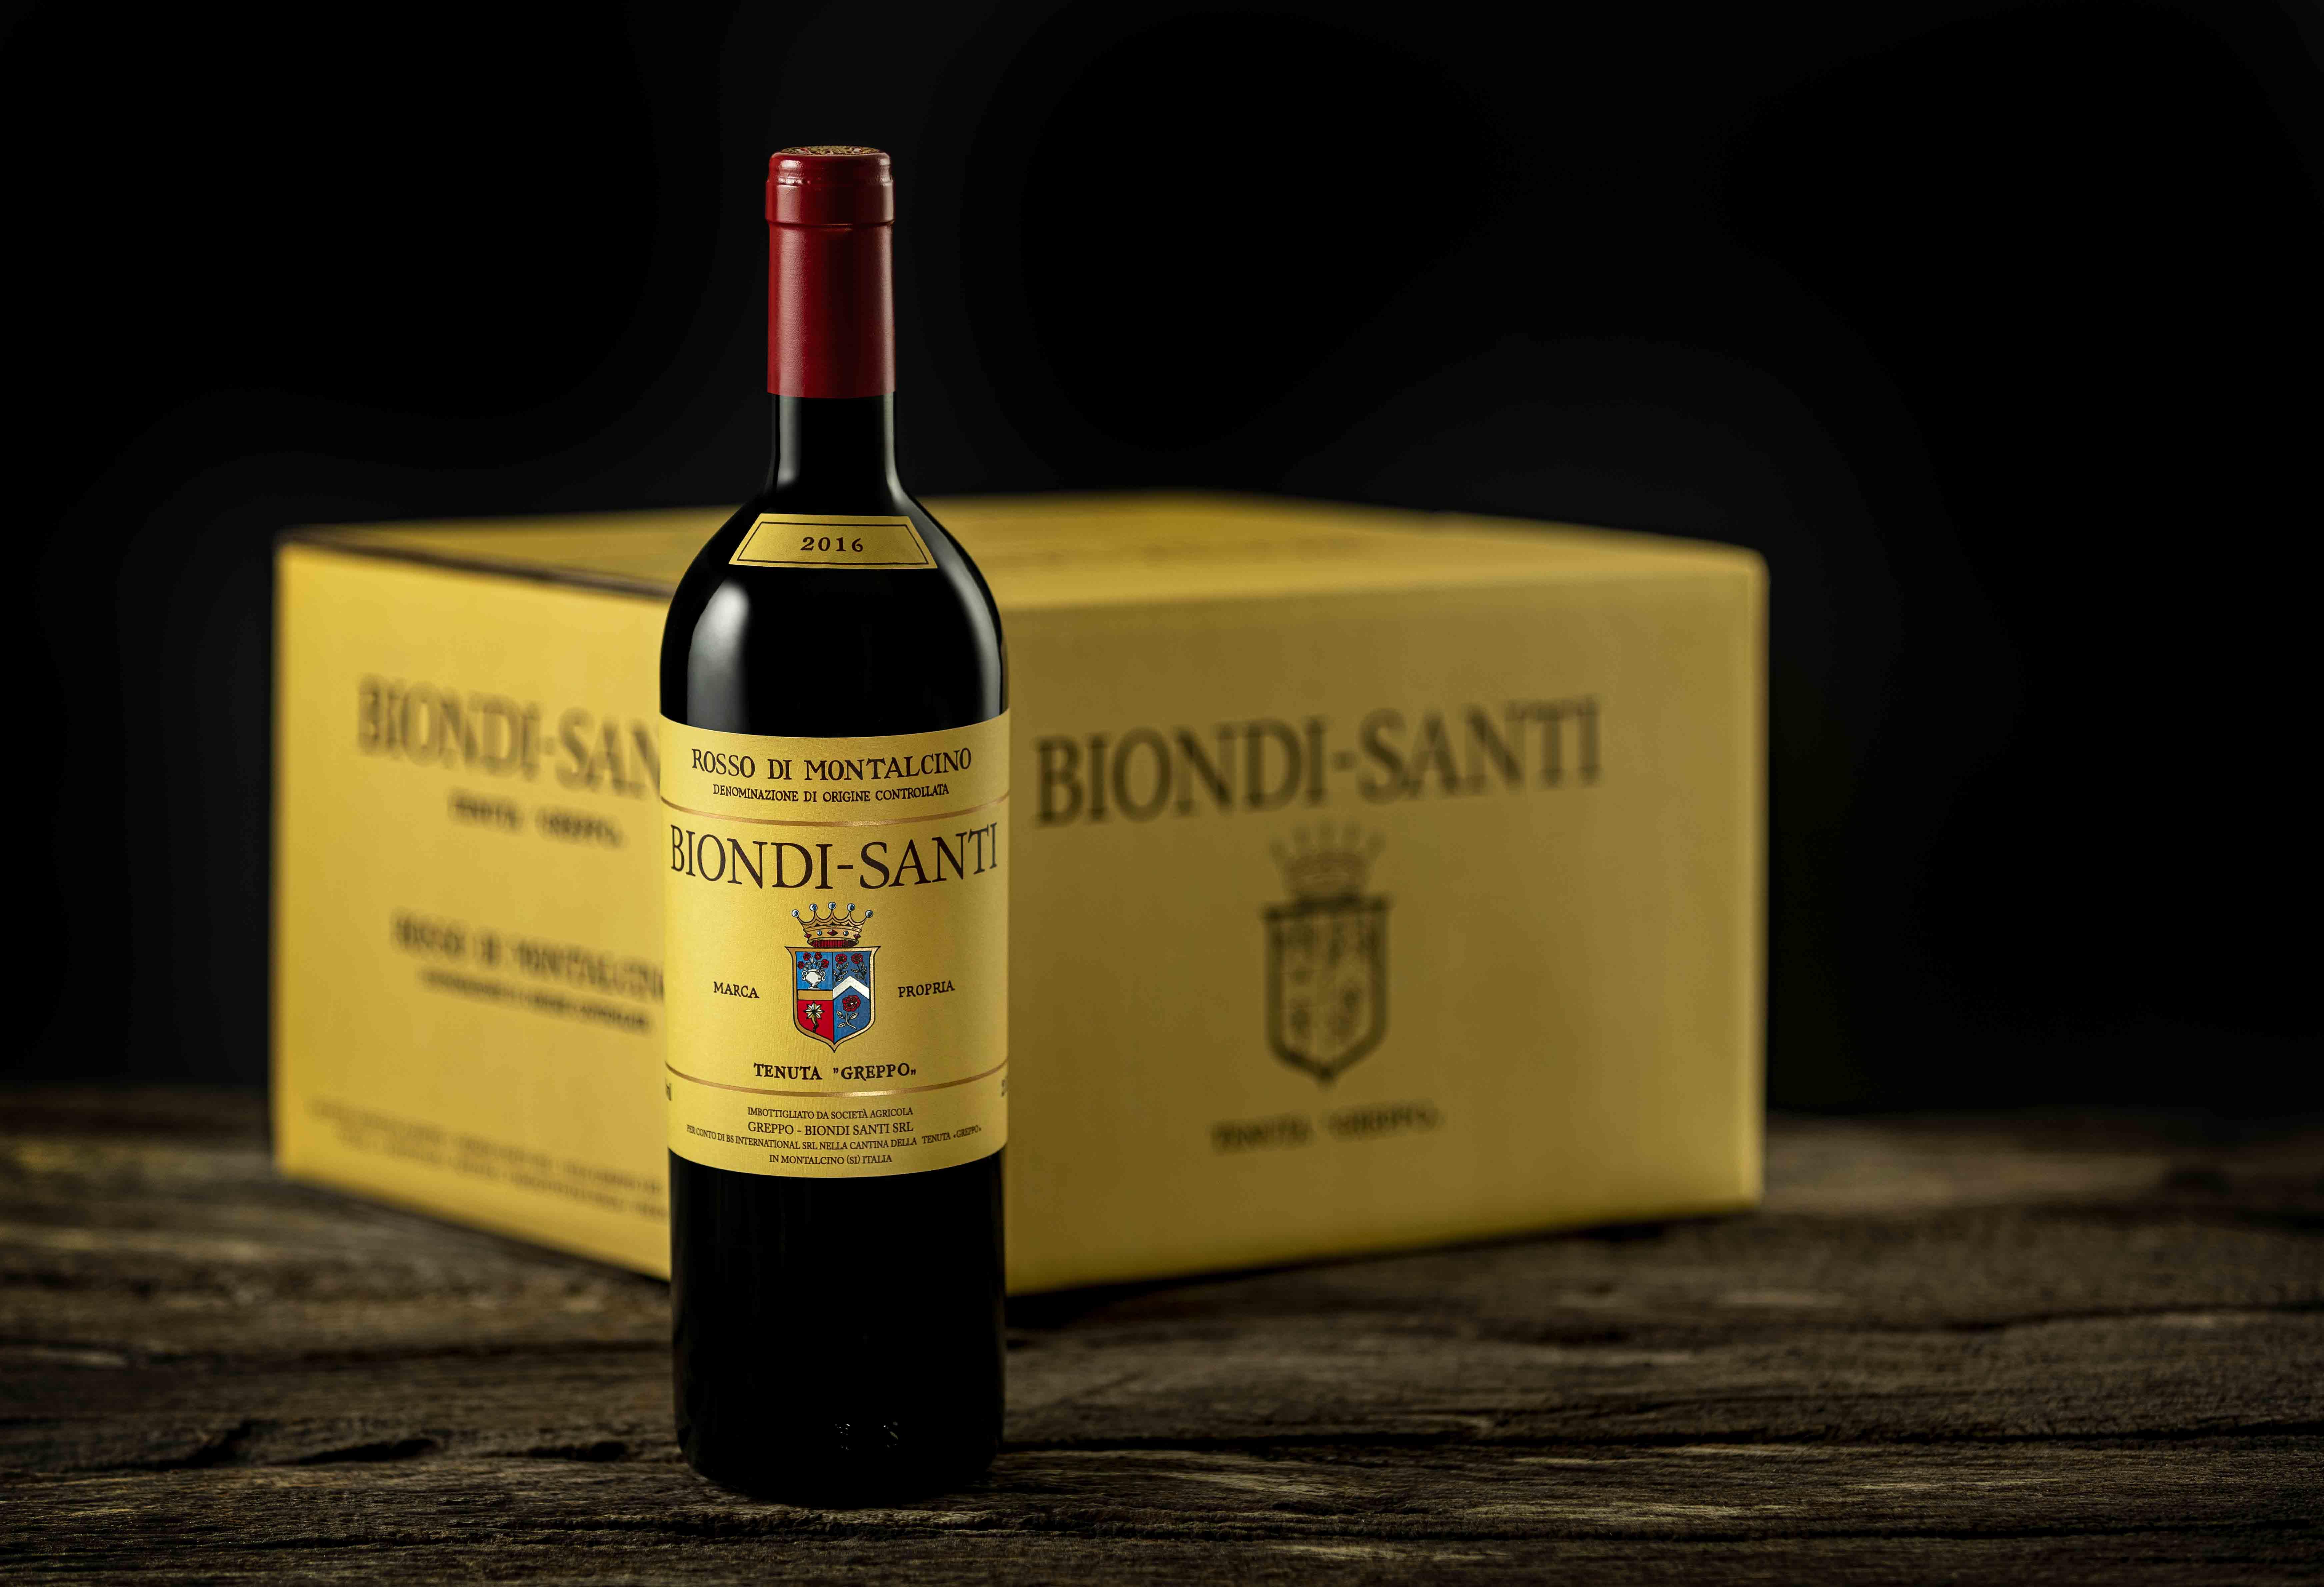 Biondi-Santi Dinner with Giampiero Bertolini, menu by Bâtard, 21st July